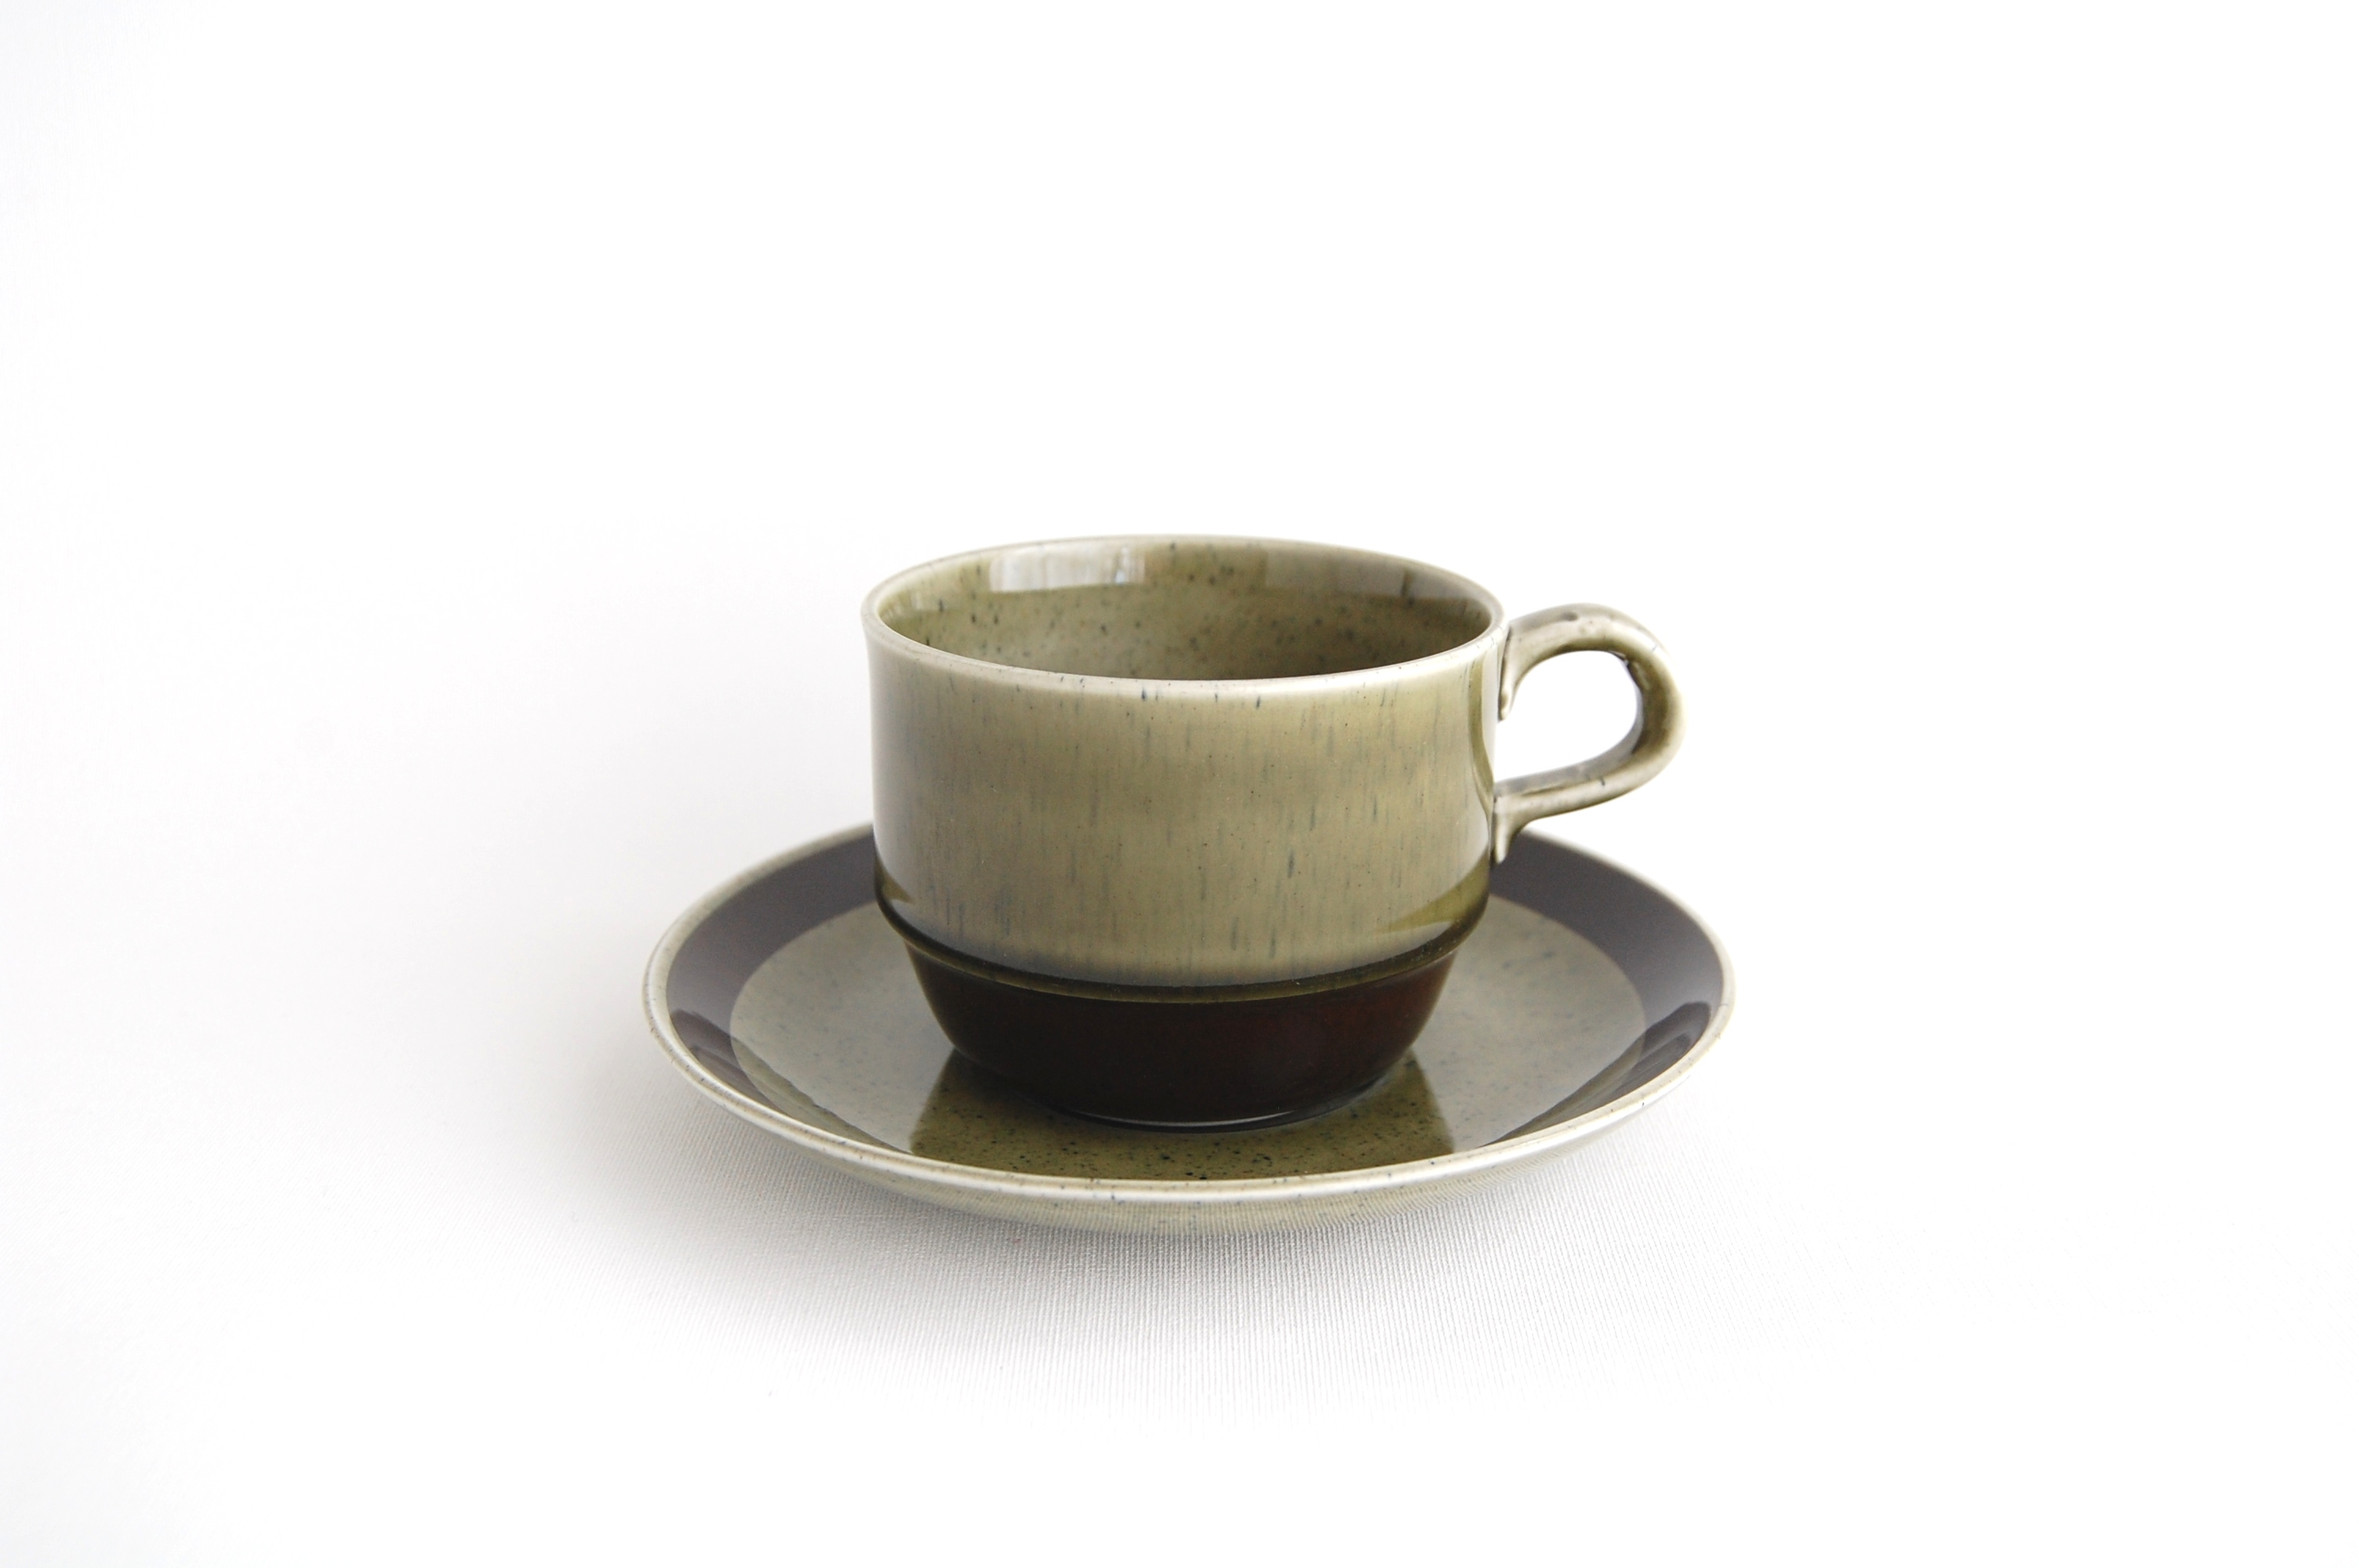 Rorstrand/ロールストランド Vieta/ヴィータ コーヒーカップ&ソーサー 003